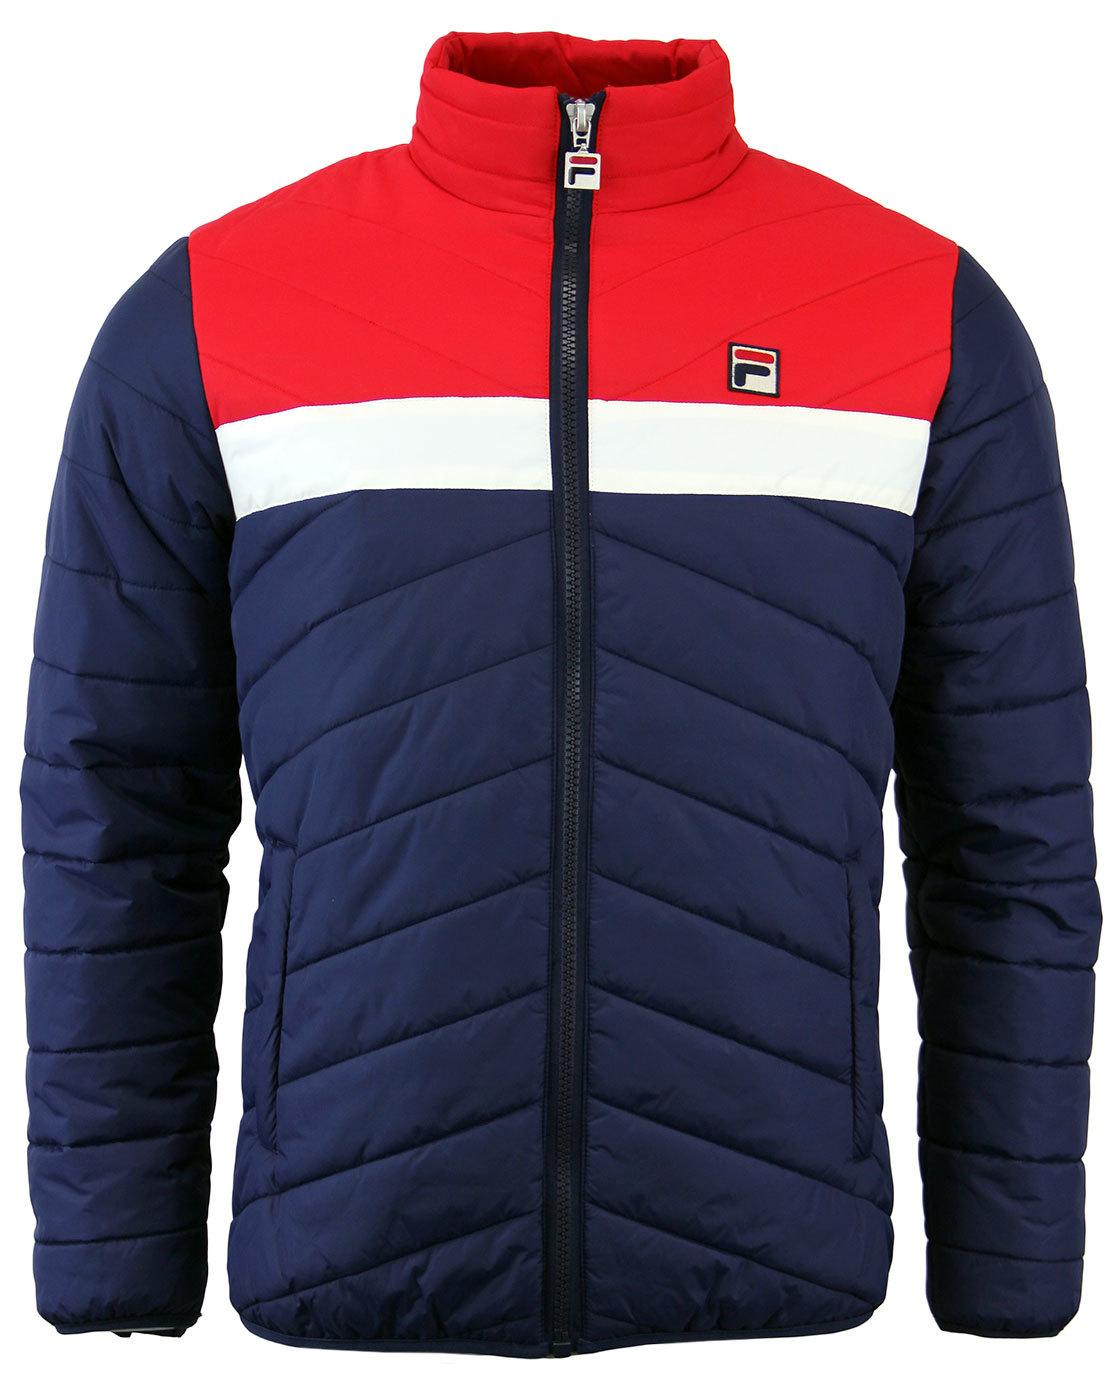 FILA VINTAGE piselli Retro Mens 70s Indie Ski Jacket